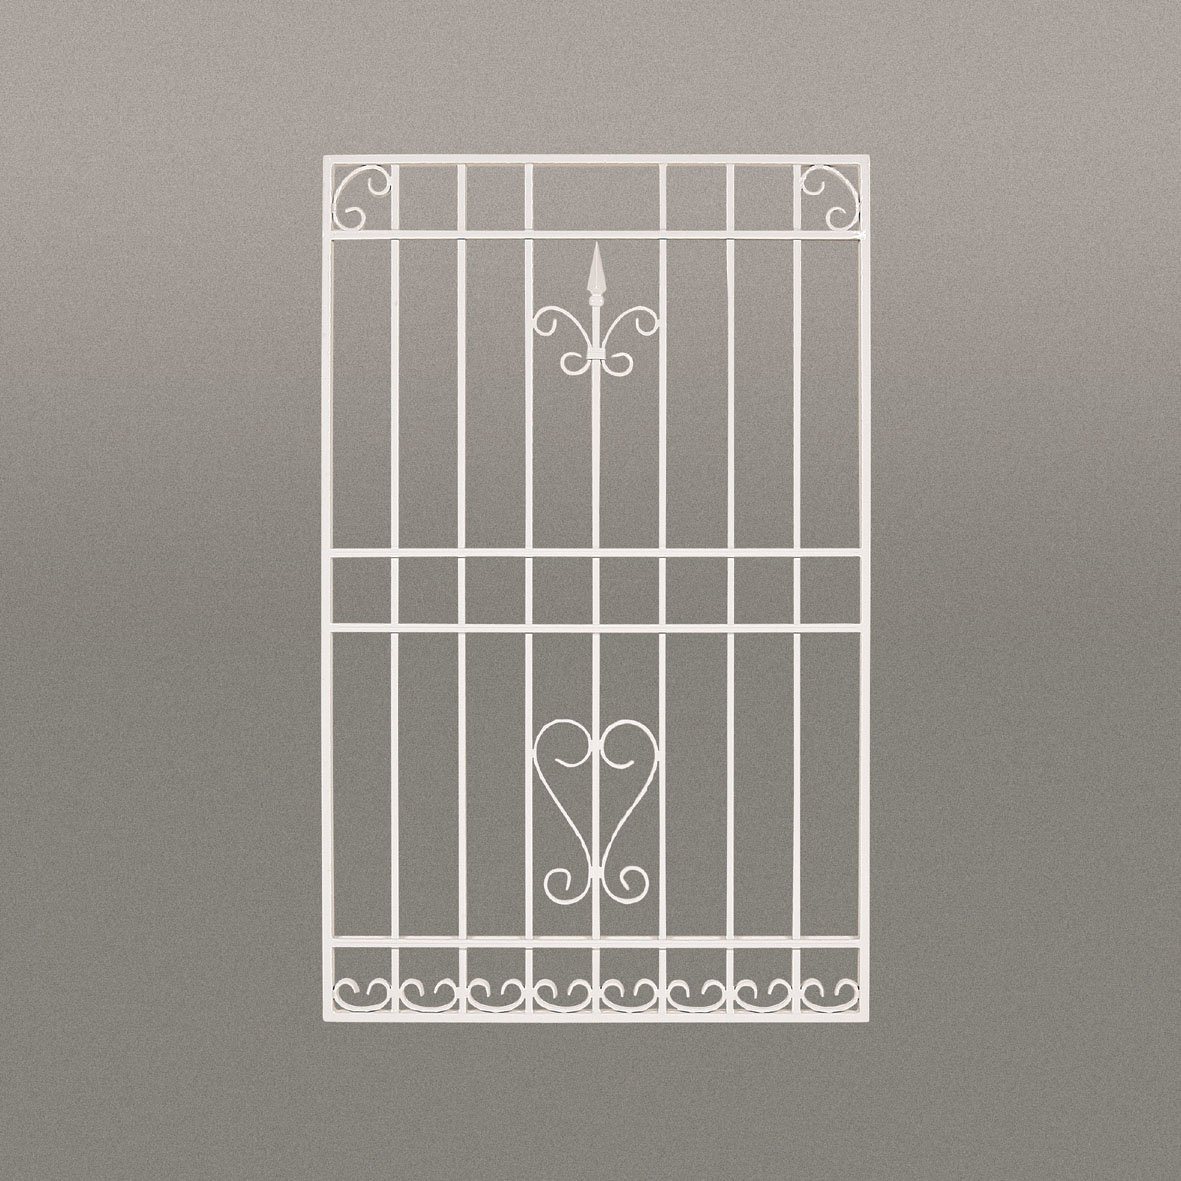 LLS ロートアルミ 装飾面格子 RAM02‐0611 650*1100 ホワイト B071VL1YCQ 26600  ホワイト